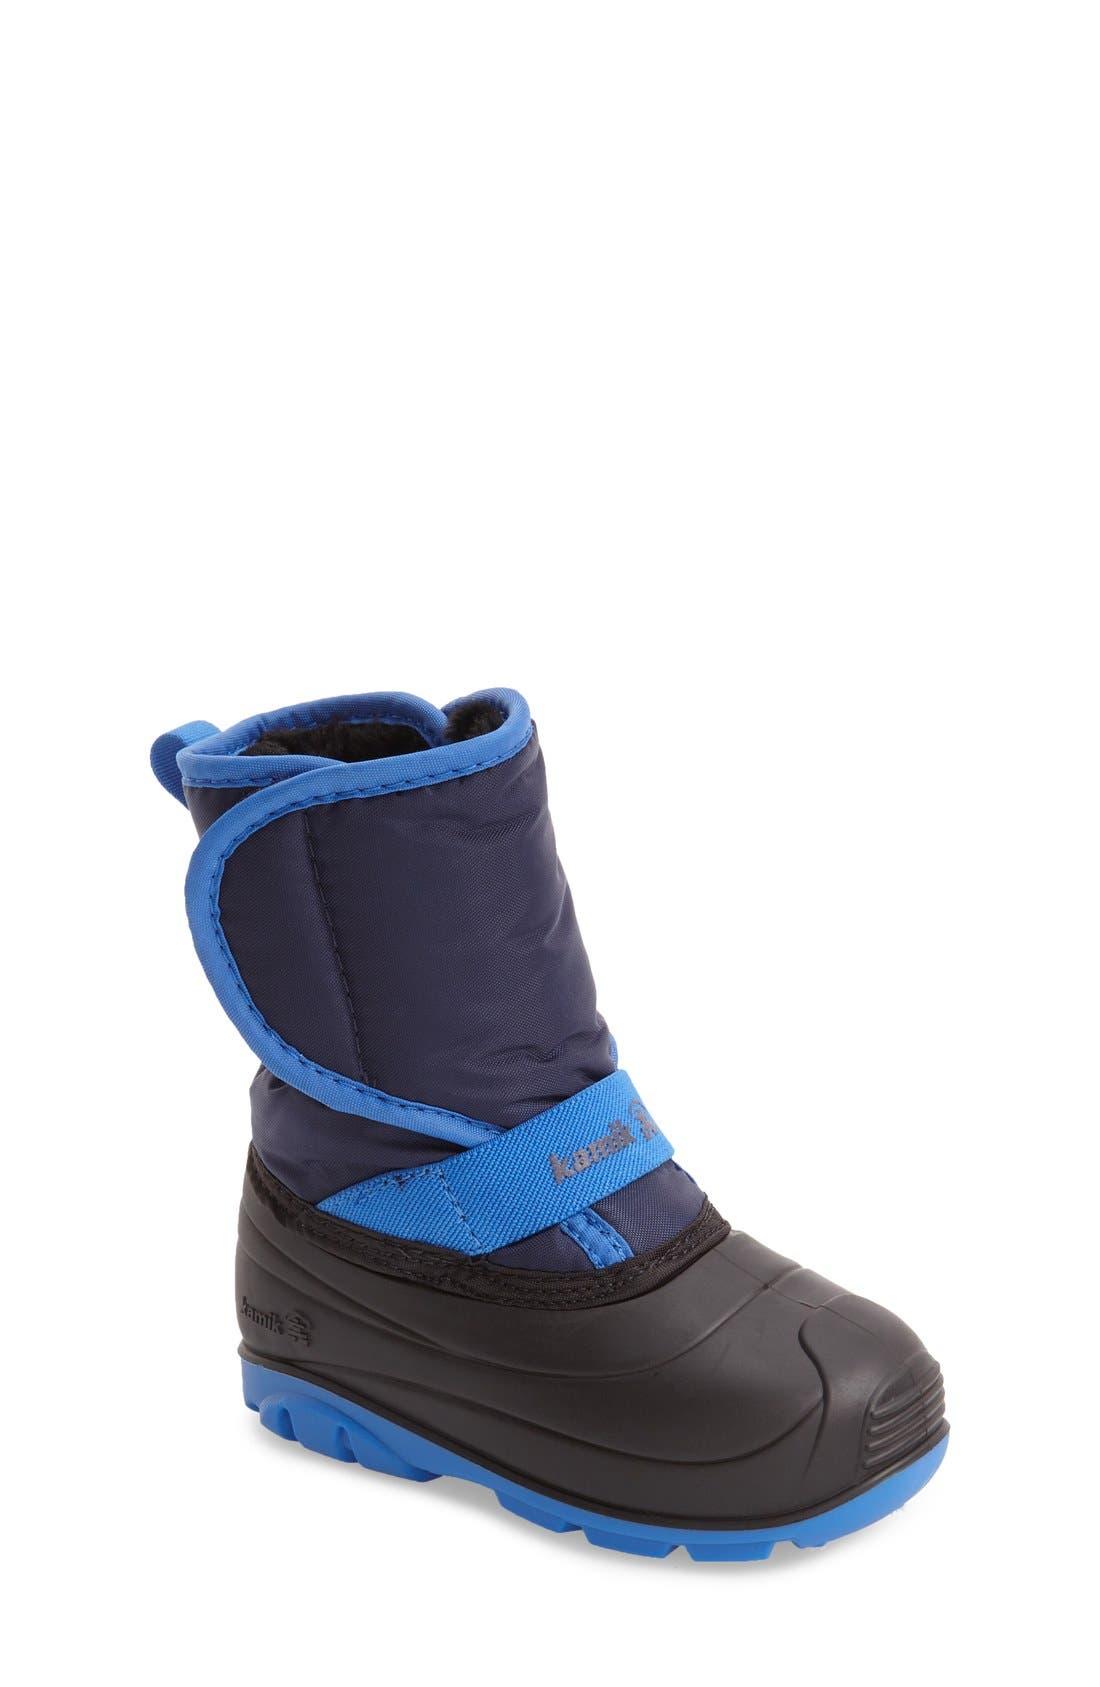 Alternate Image 1 Selected - Kamik Pika Waterproof Faux Fur Lined Snow Boot (Walker & Toddler)